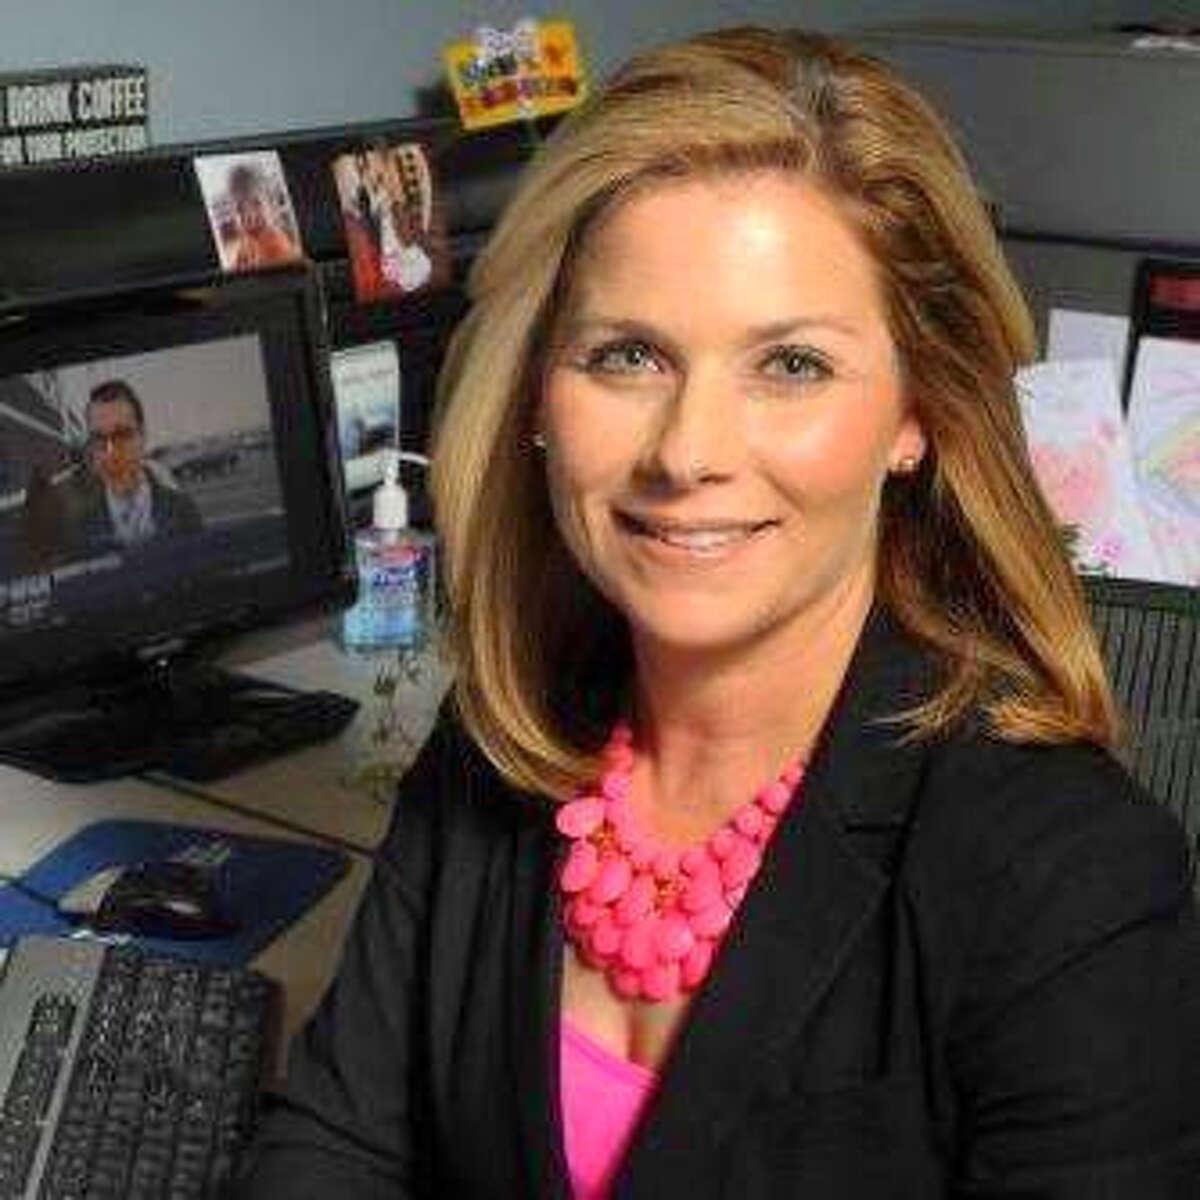 Julie Chapman: Morning anchor at Spectrum News.